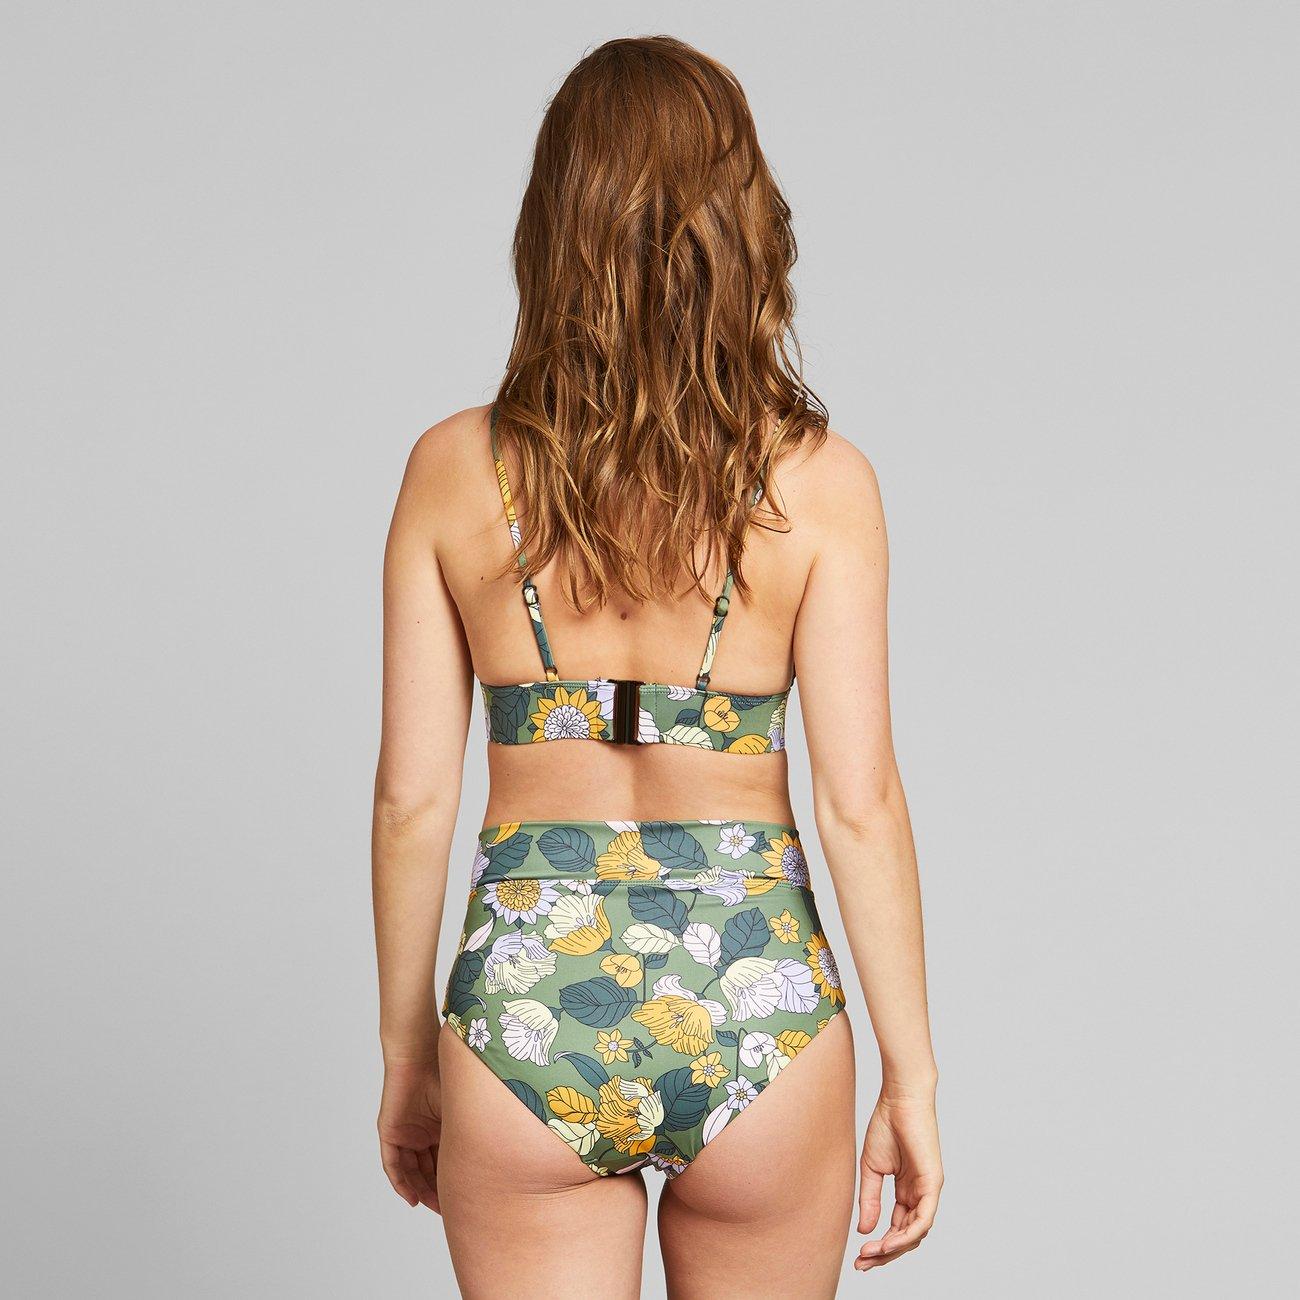 Dedicated - Bikini Pants Slite Seventies Floral Green